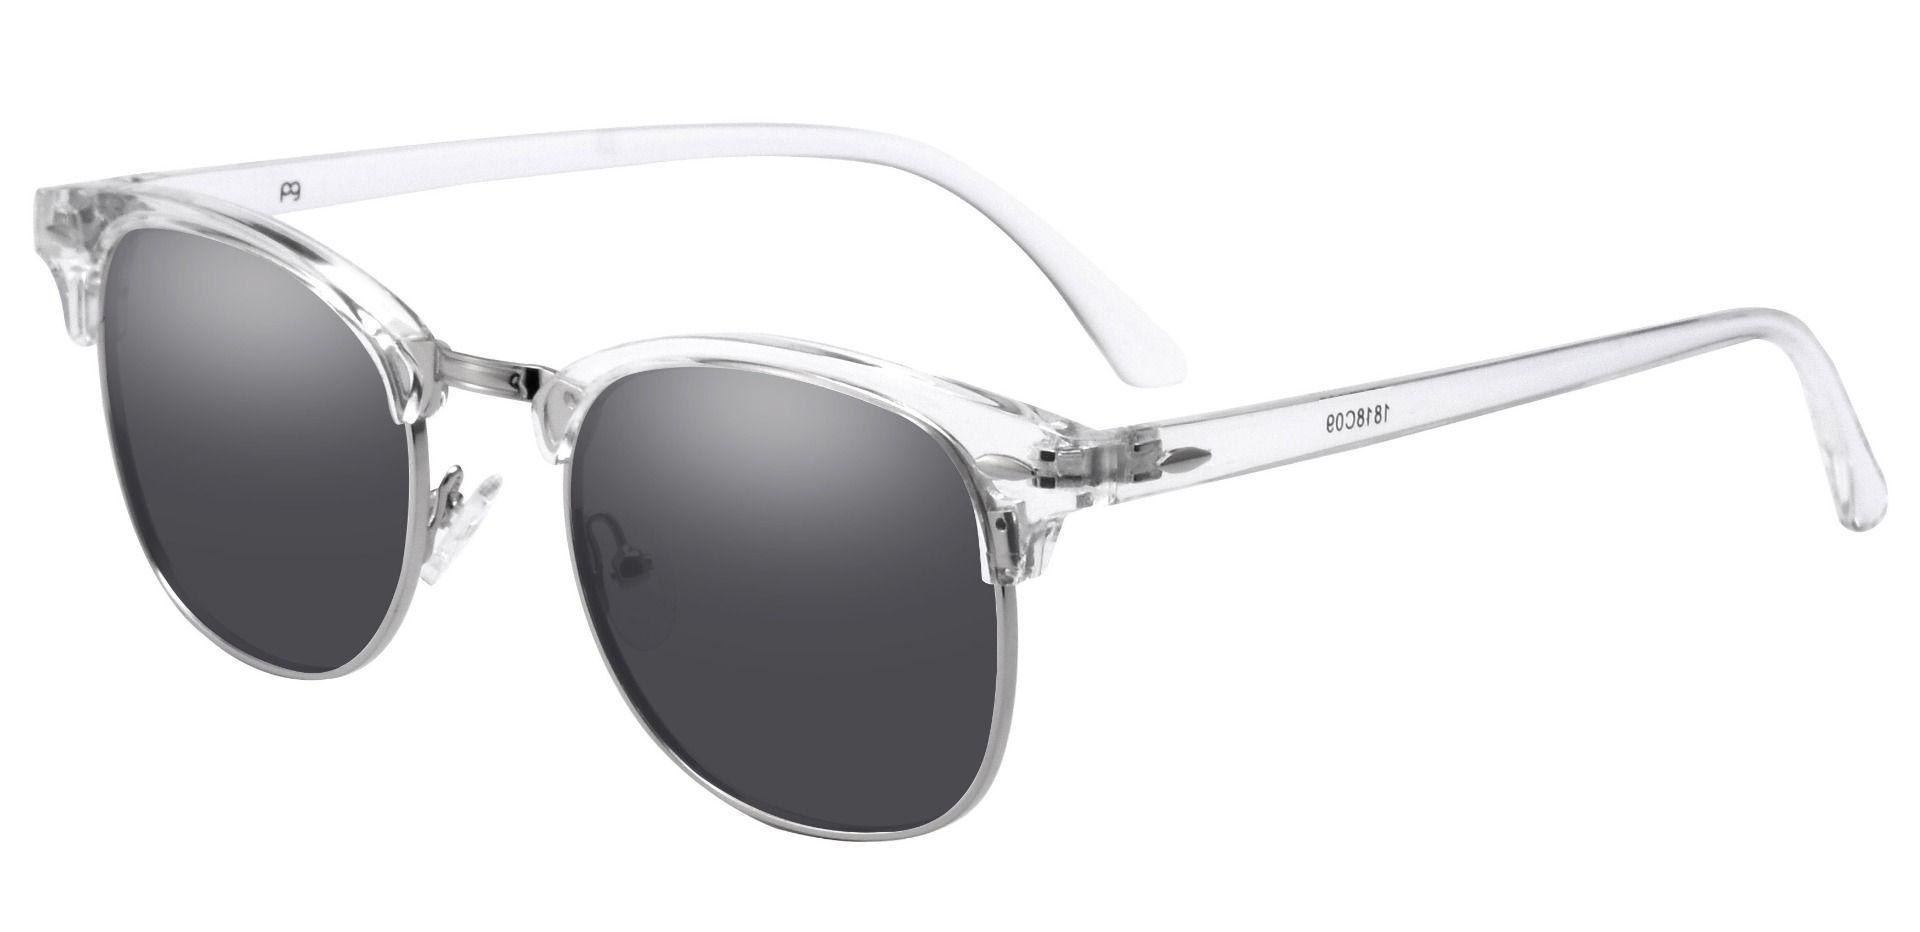 Salvatore Browline Prescription Sunglasses - Clear Frame With Gray Lenses